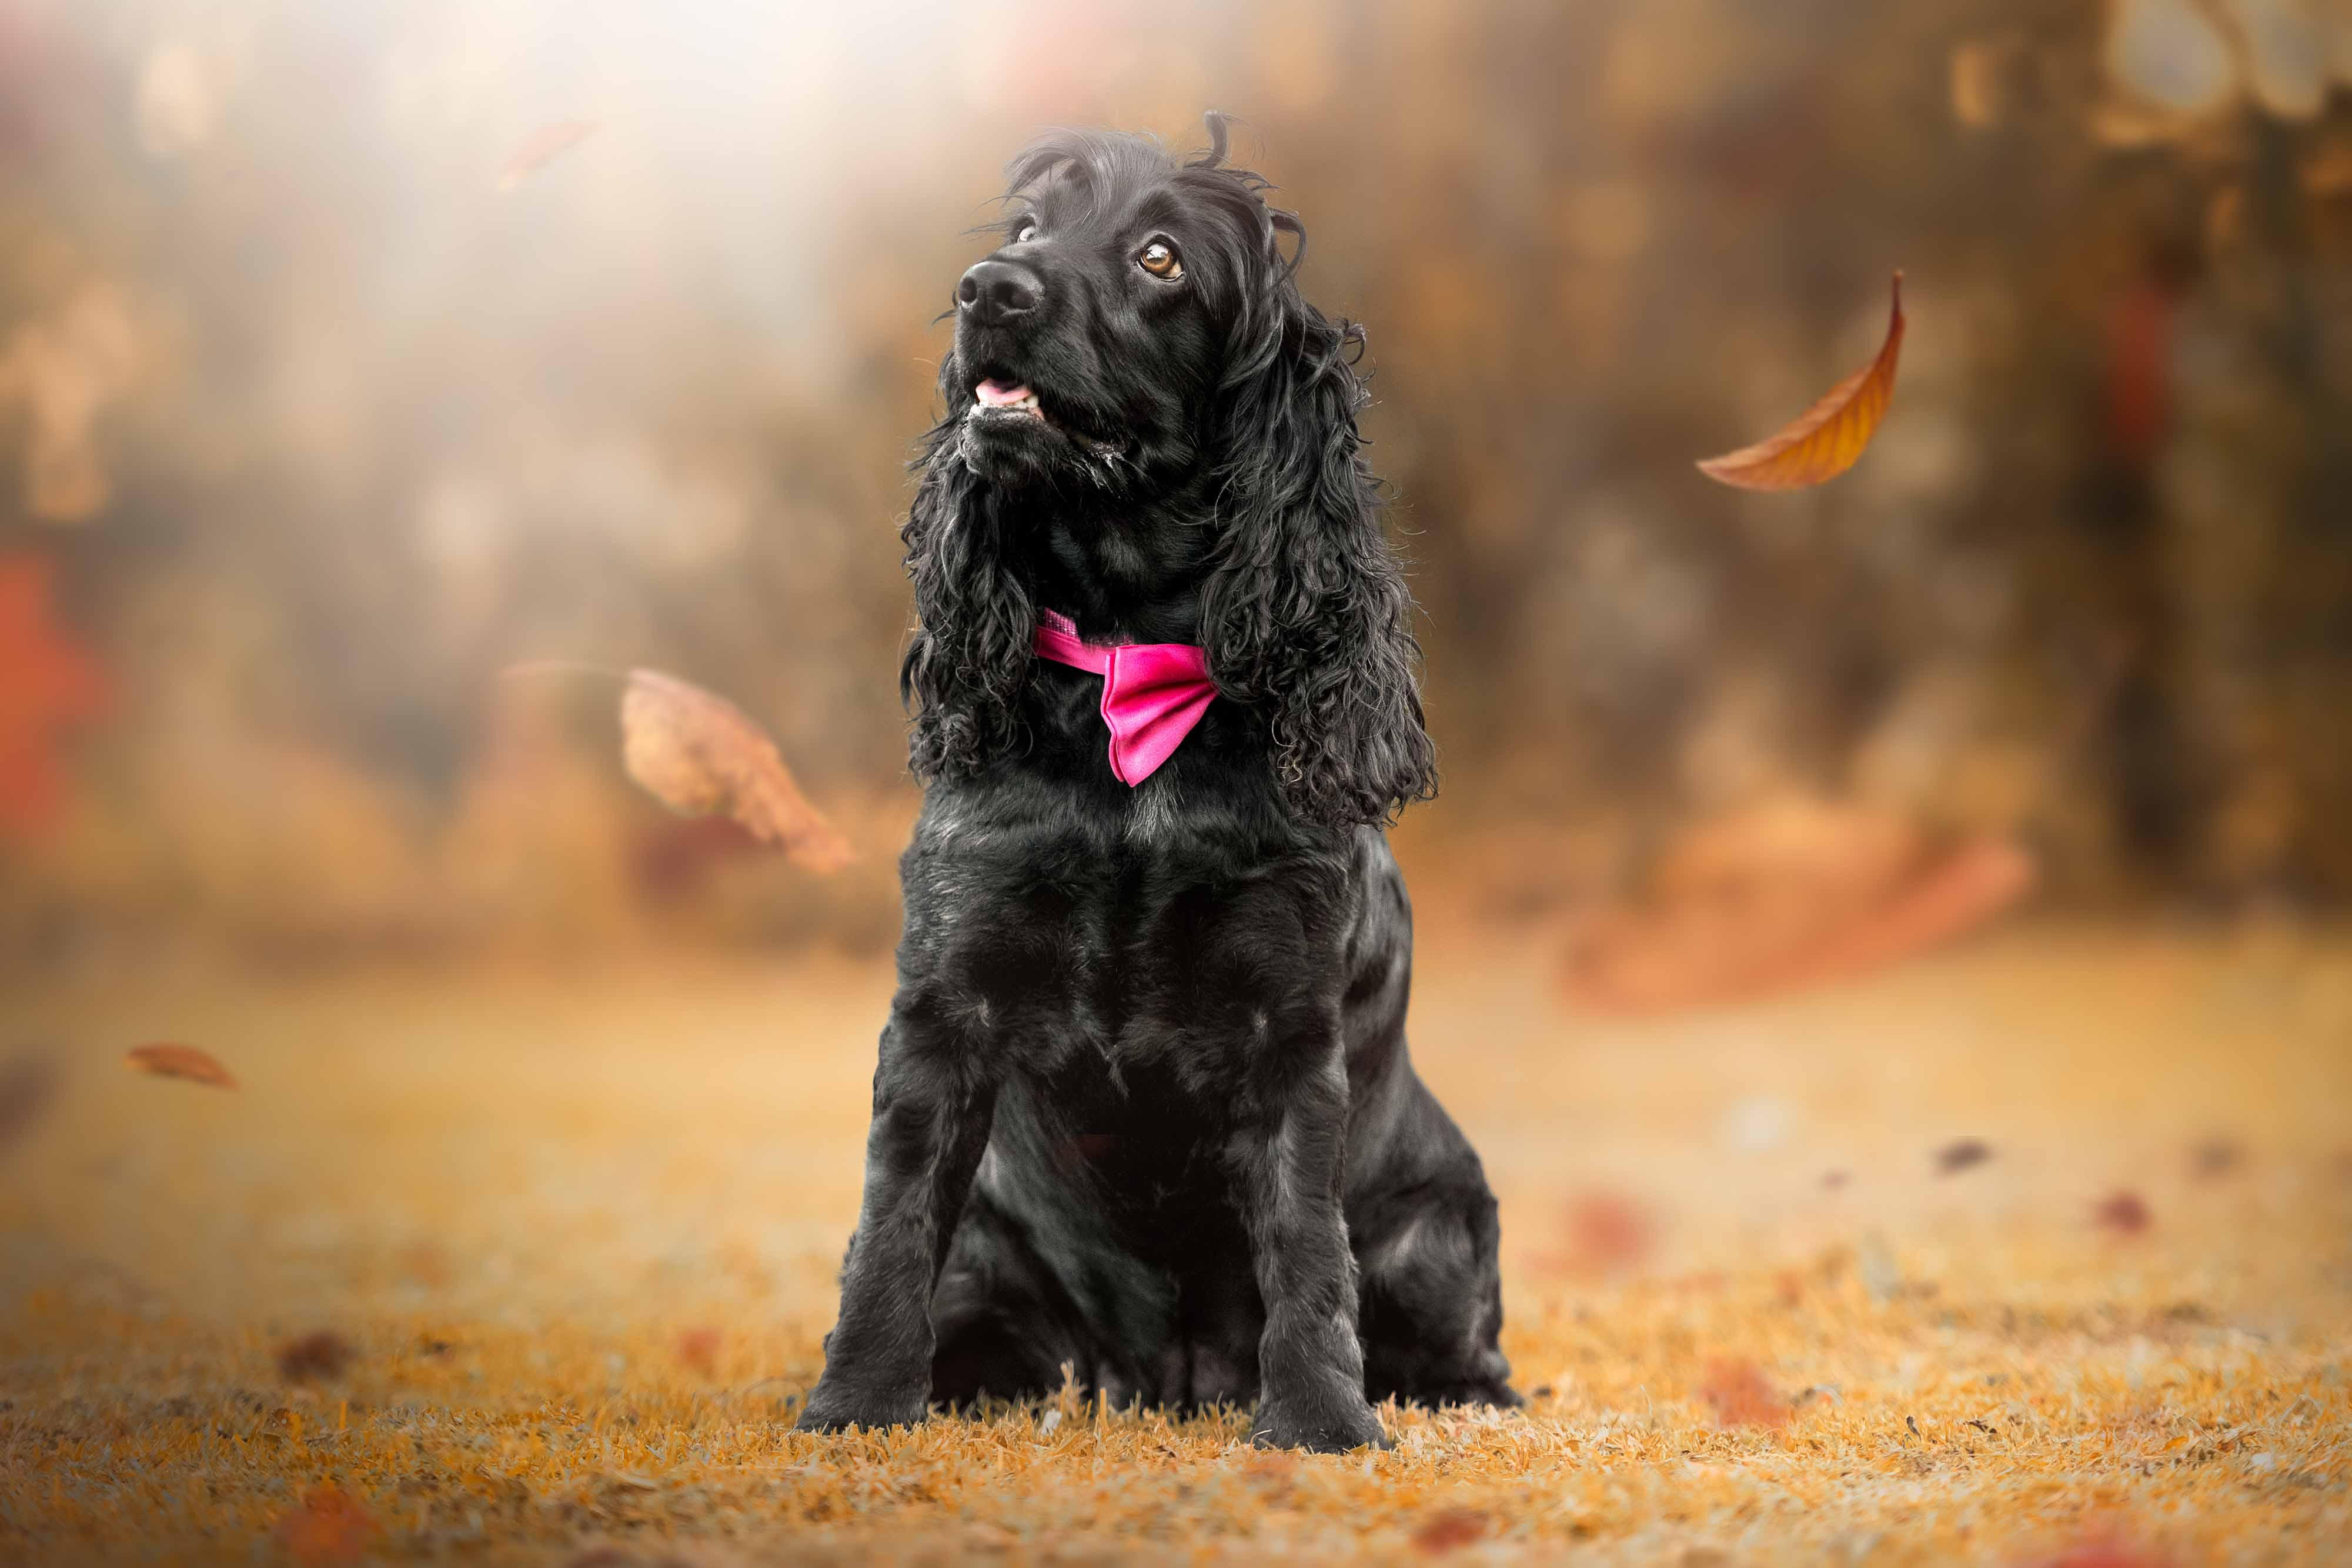 https://www.melissapohlphotography.com/wp-content/uploads/Black-spaniel-in-autumn.jpg